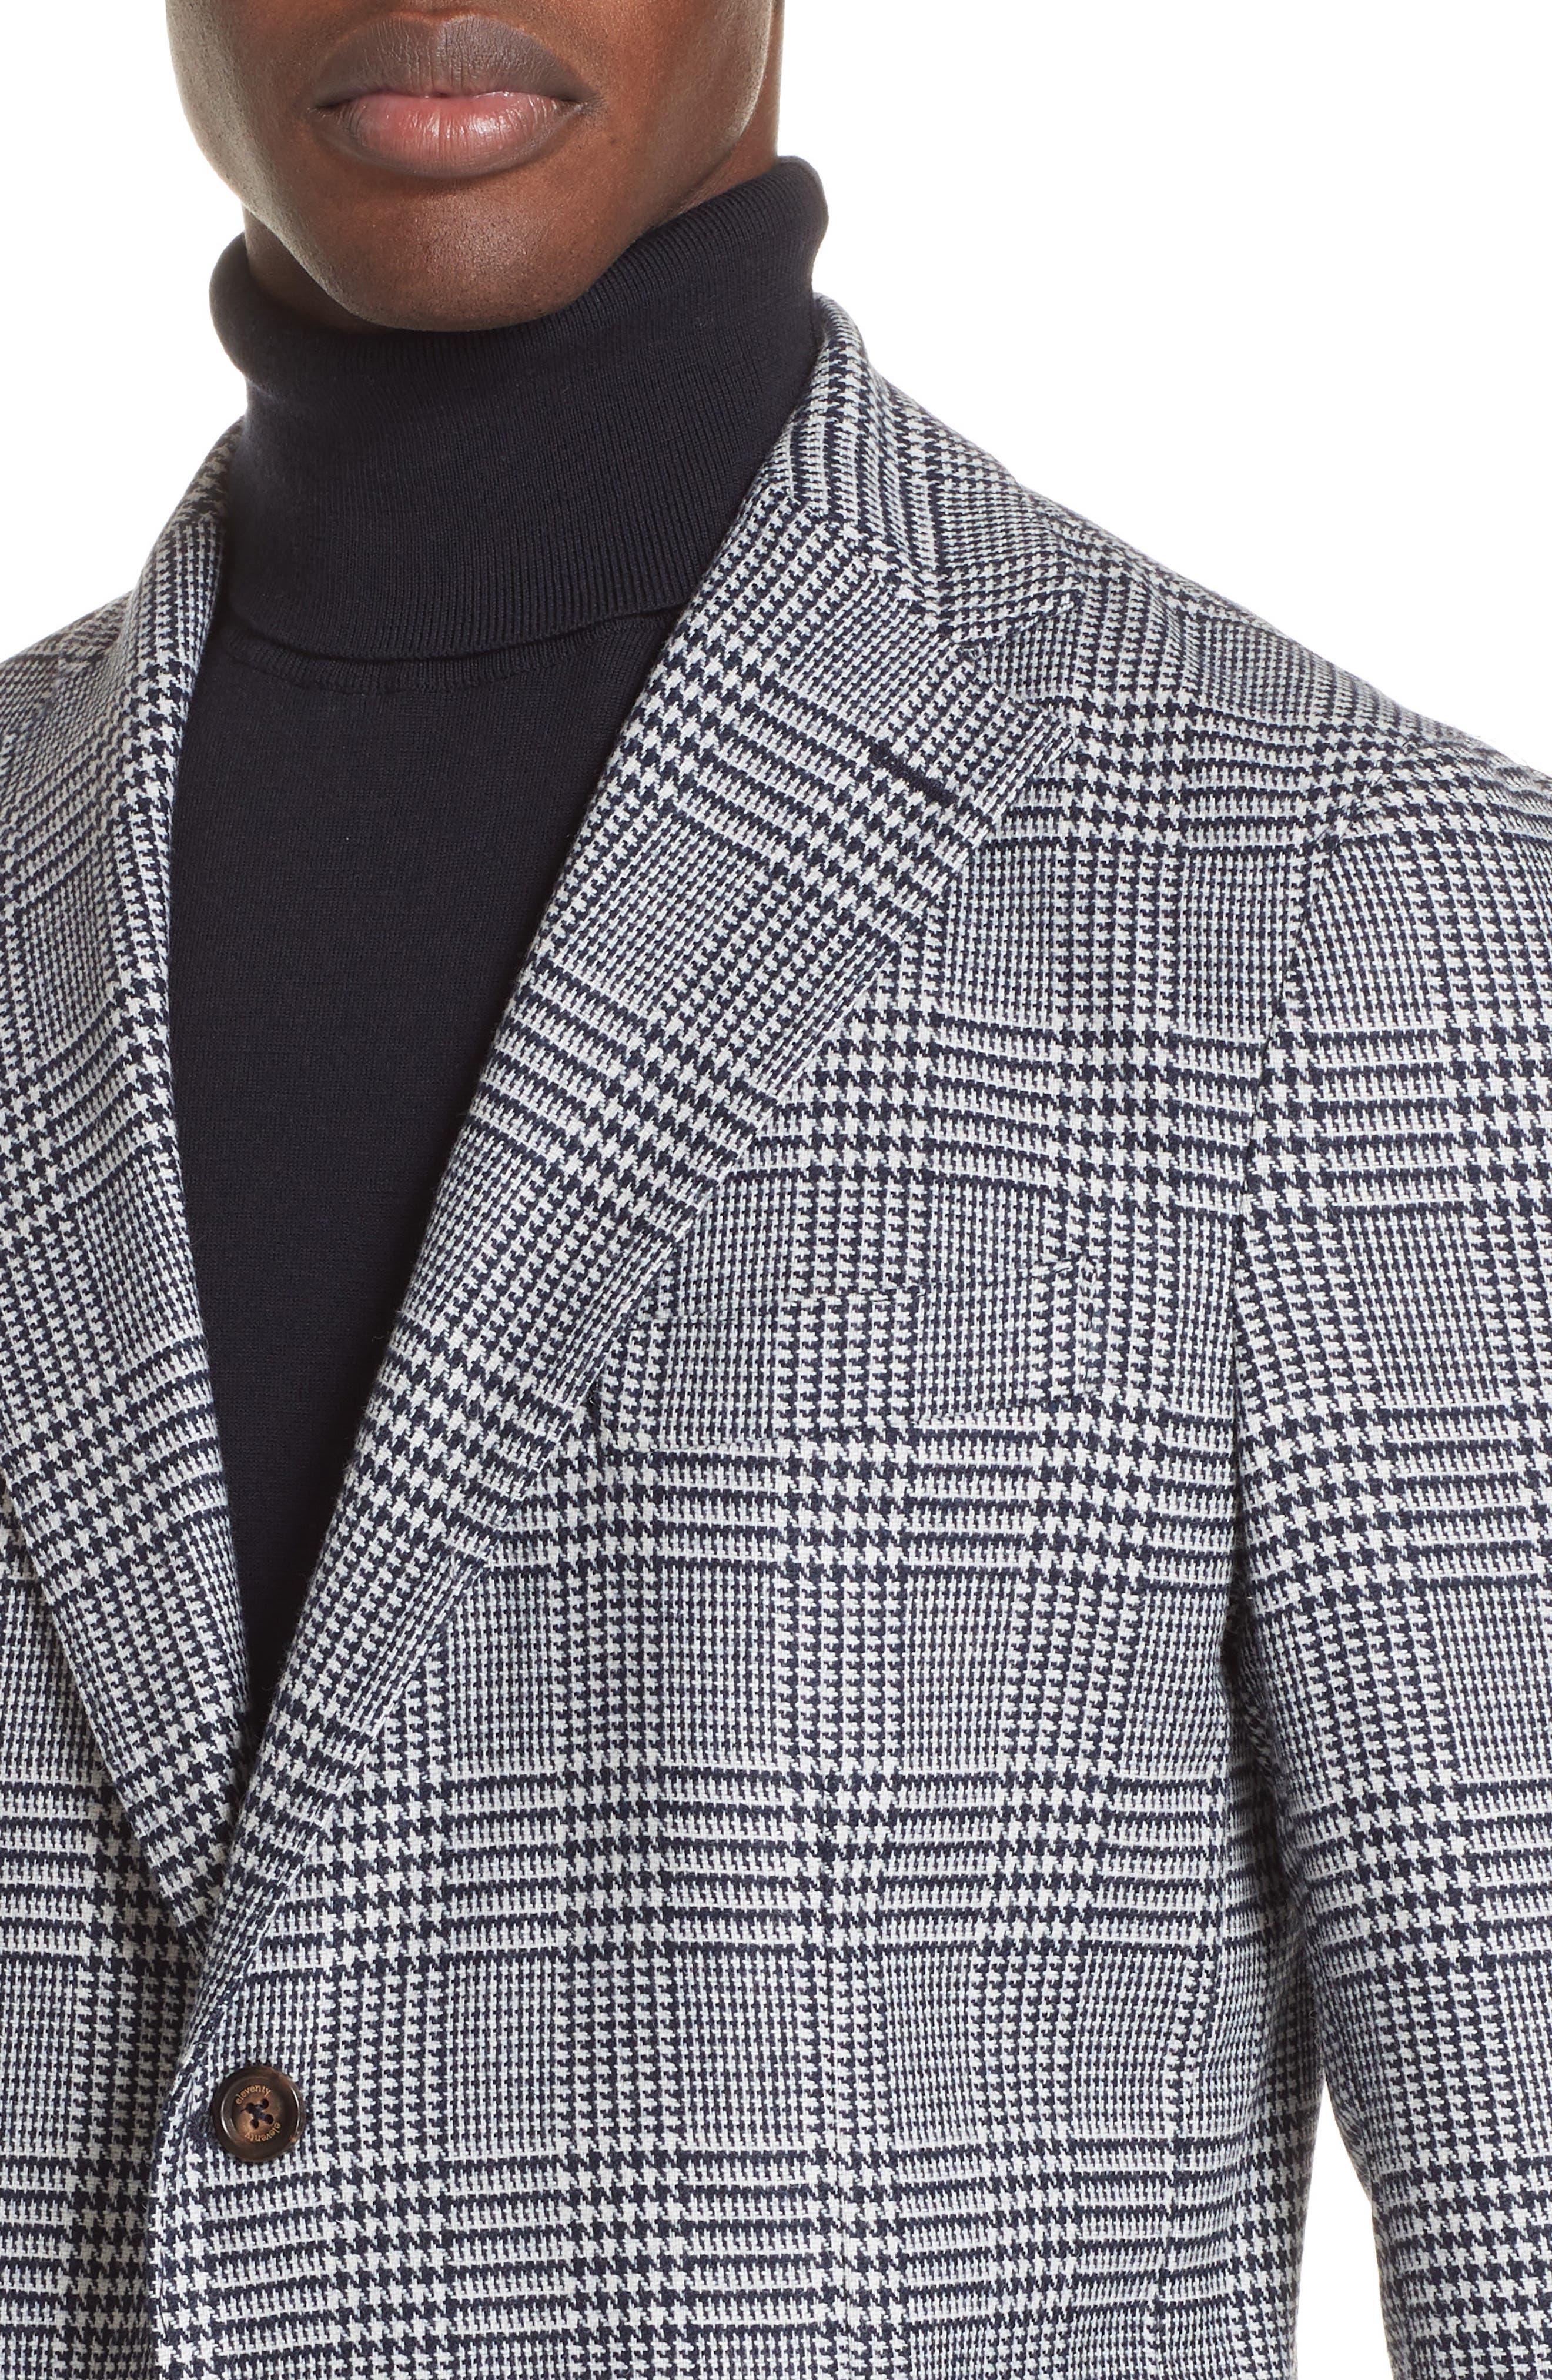 Trim Fit Plaid Stretch Wool Blend Sport Coat,                             Alternate thumbnail 4, color,                             NAVY